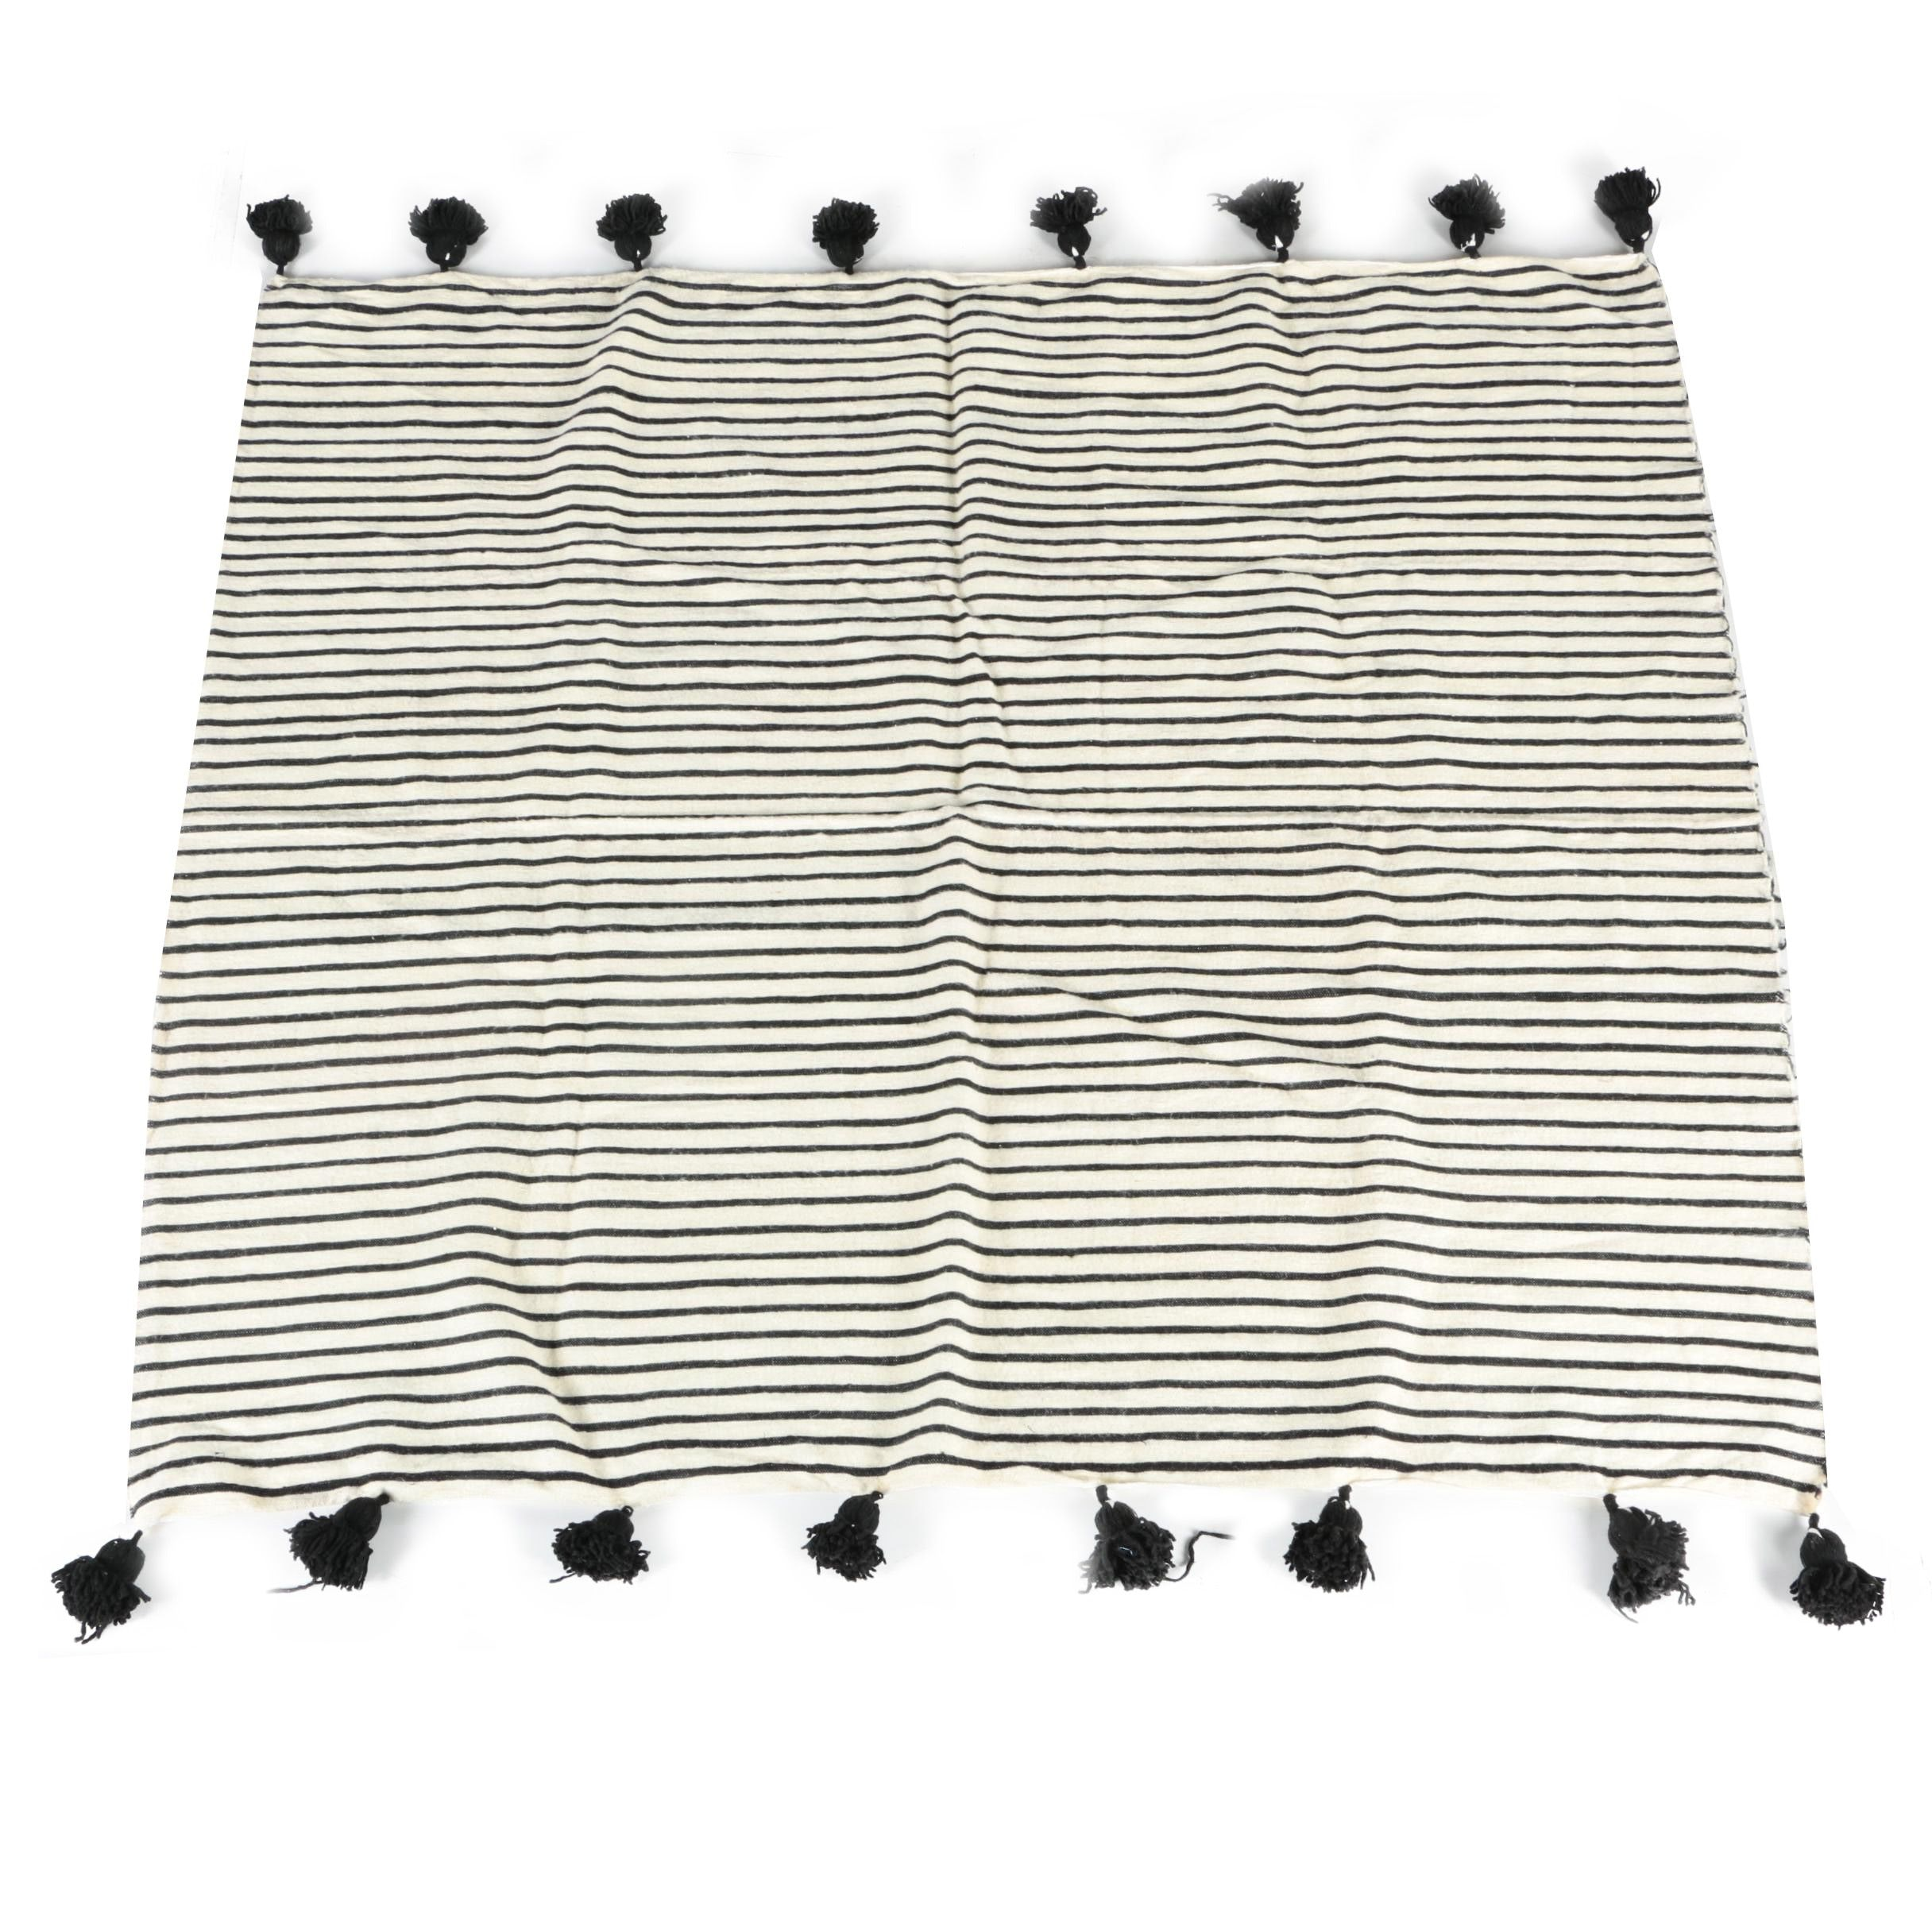 Handwoven Moroccan Wool Throw Blanket